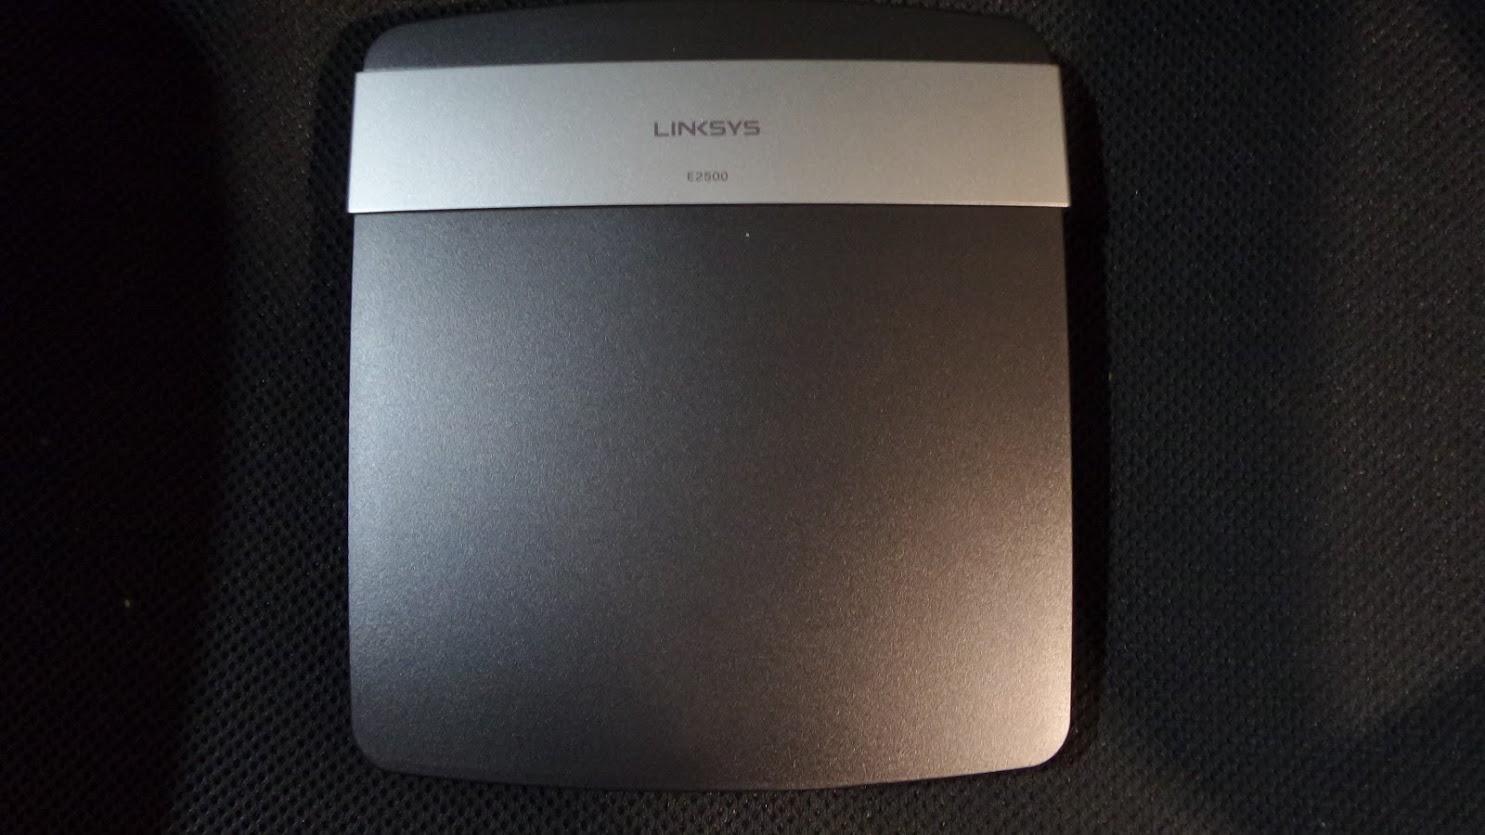 Review] Linksys E2500 N600 เราเตอร์เรียบสวย ราคาไม่แพง แต่เก่งจริง